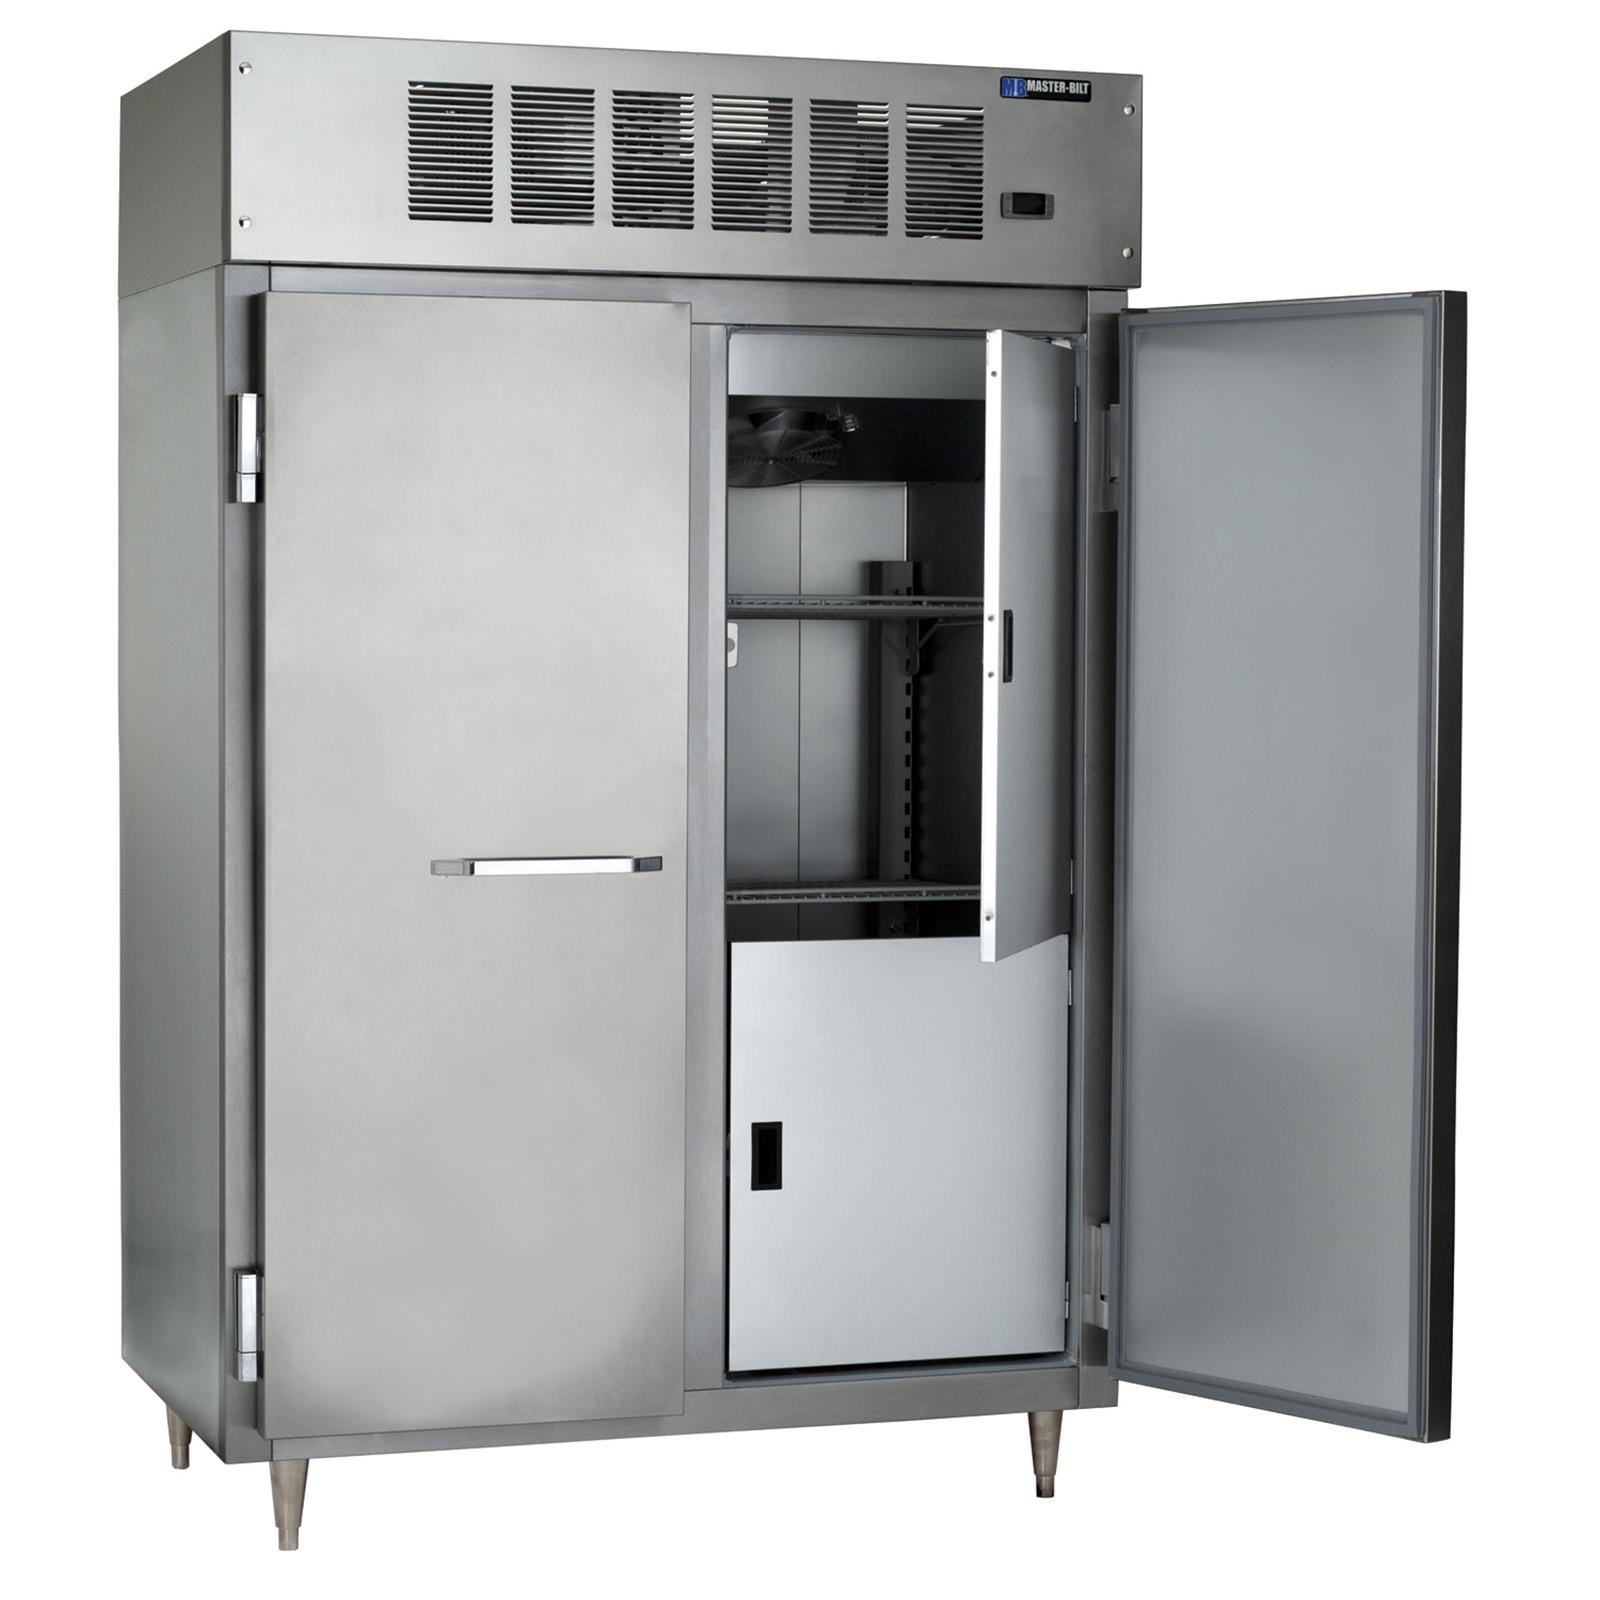 Master-Bilt Products IHC-48 ice cream hardening cabinet